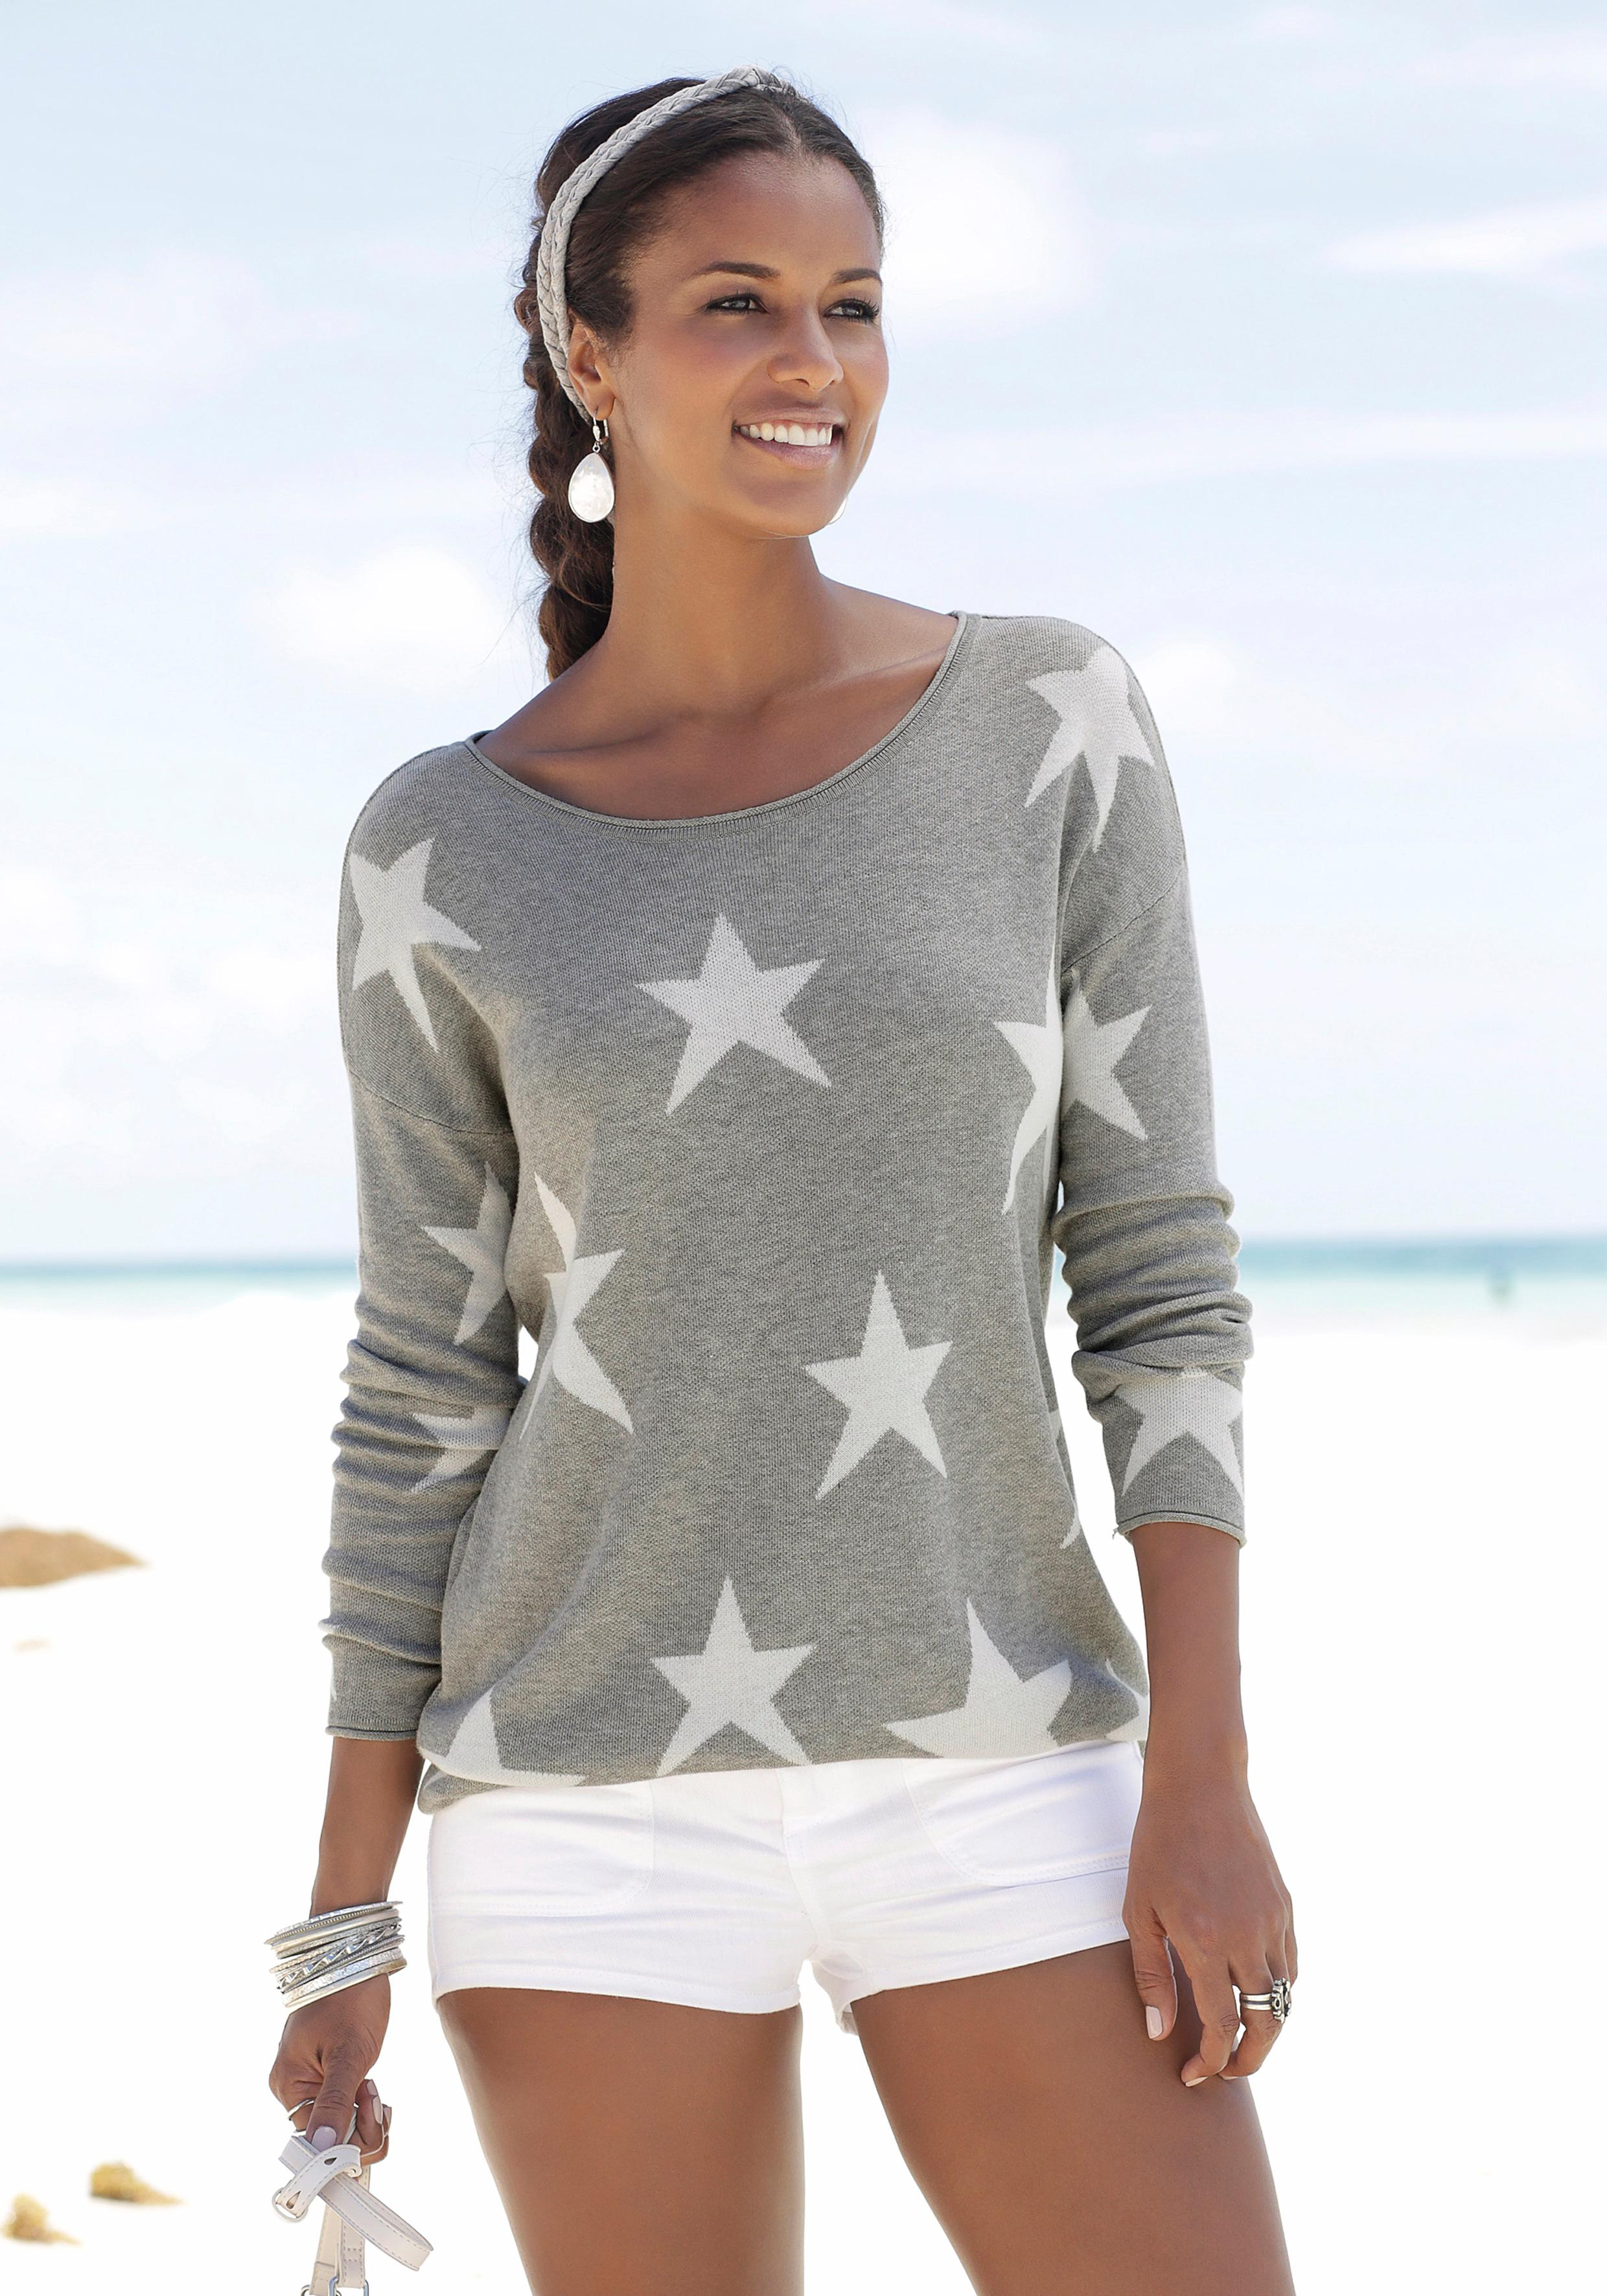 LASCANA Strandpullover | Bekleidung > Bademode > Strandbekleidung | Lascana